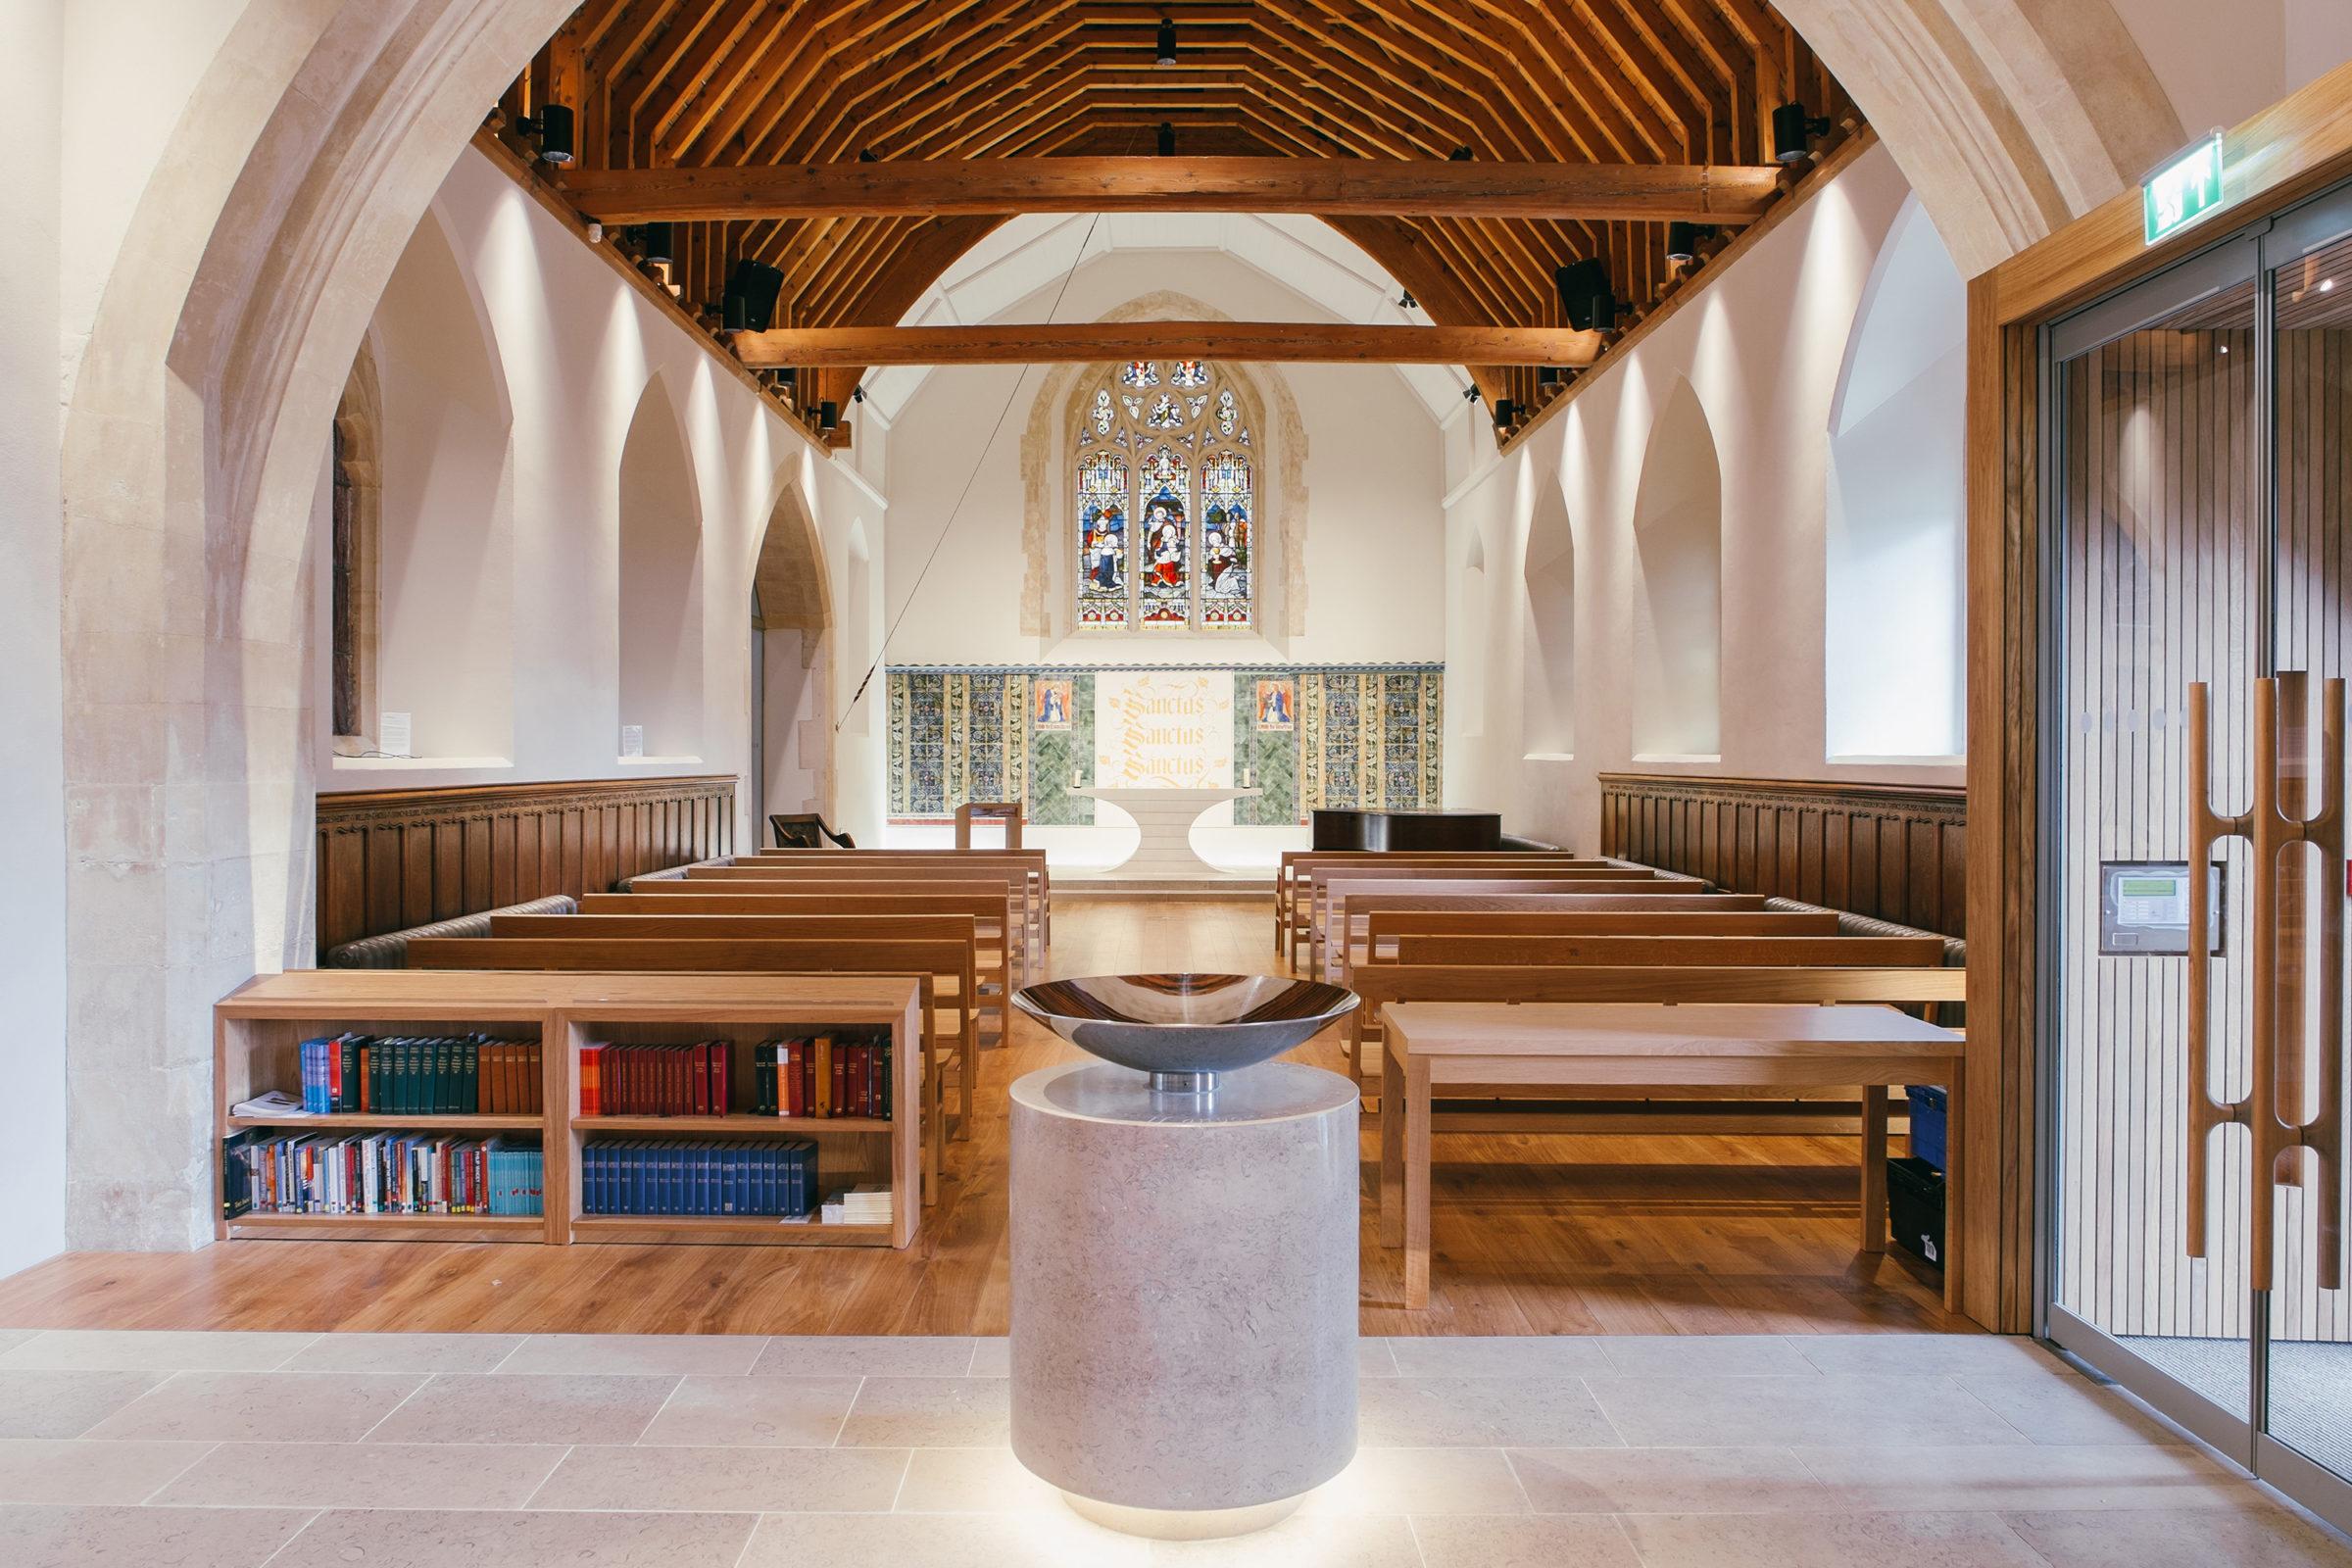 Design Engine UoW Chapel Interior Font and altar